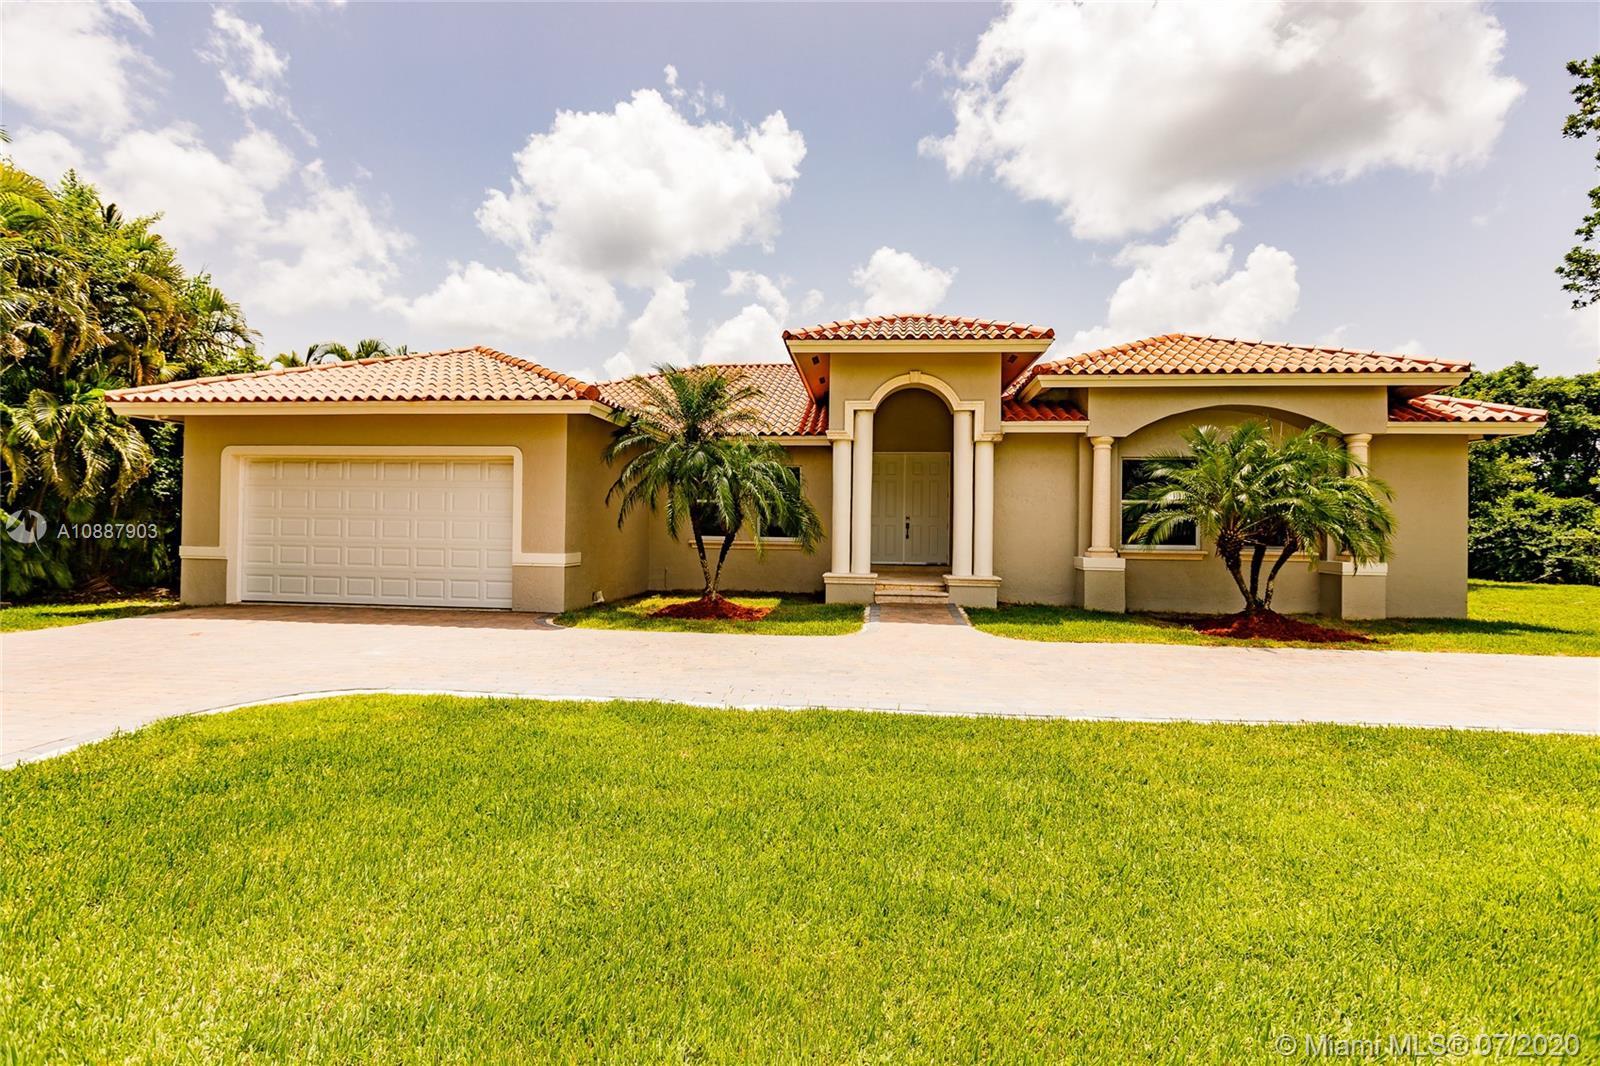 24395 Sw 202nd Ave Property Photo